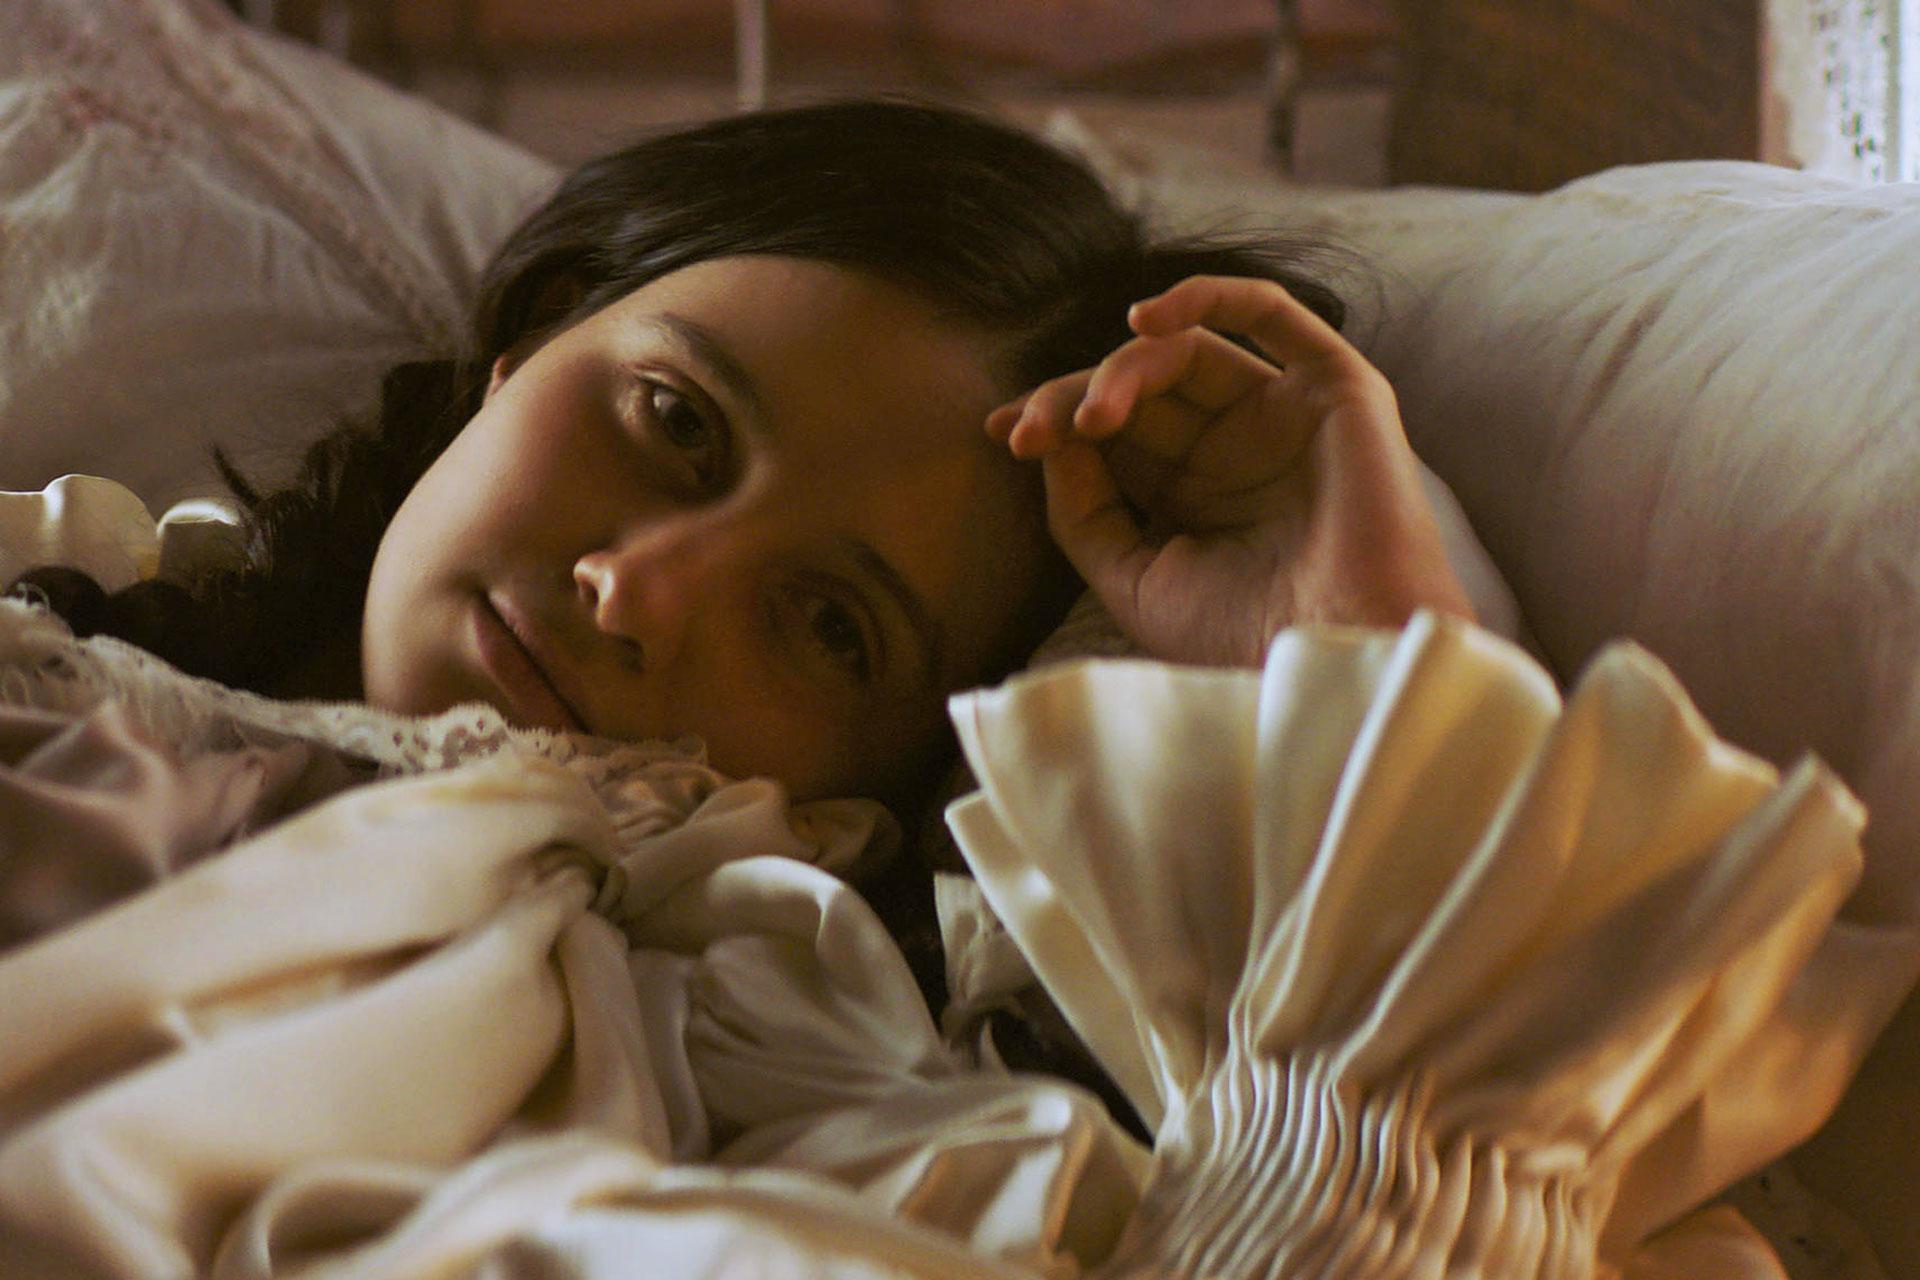 Emma (Julia Goldani Telles) seems resigned to her fate.